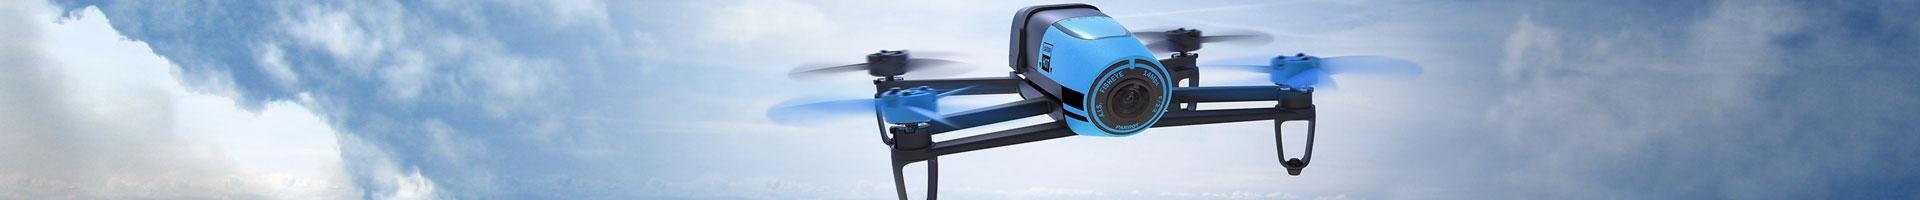 dronex pro review australia